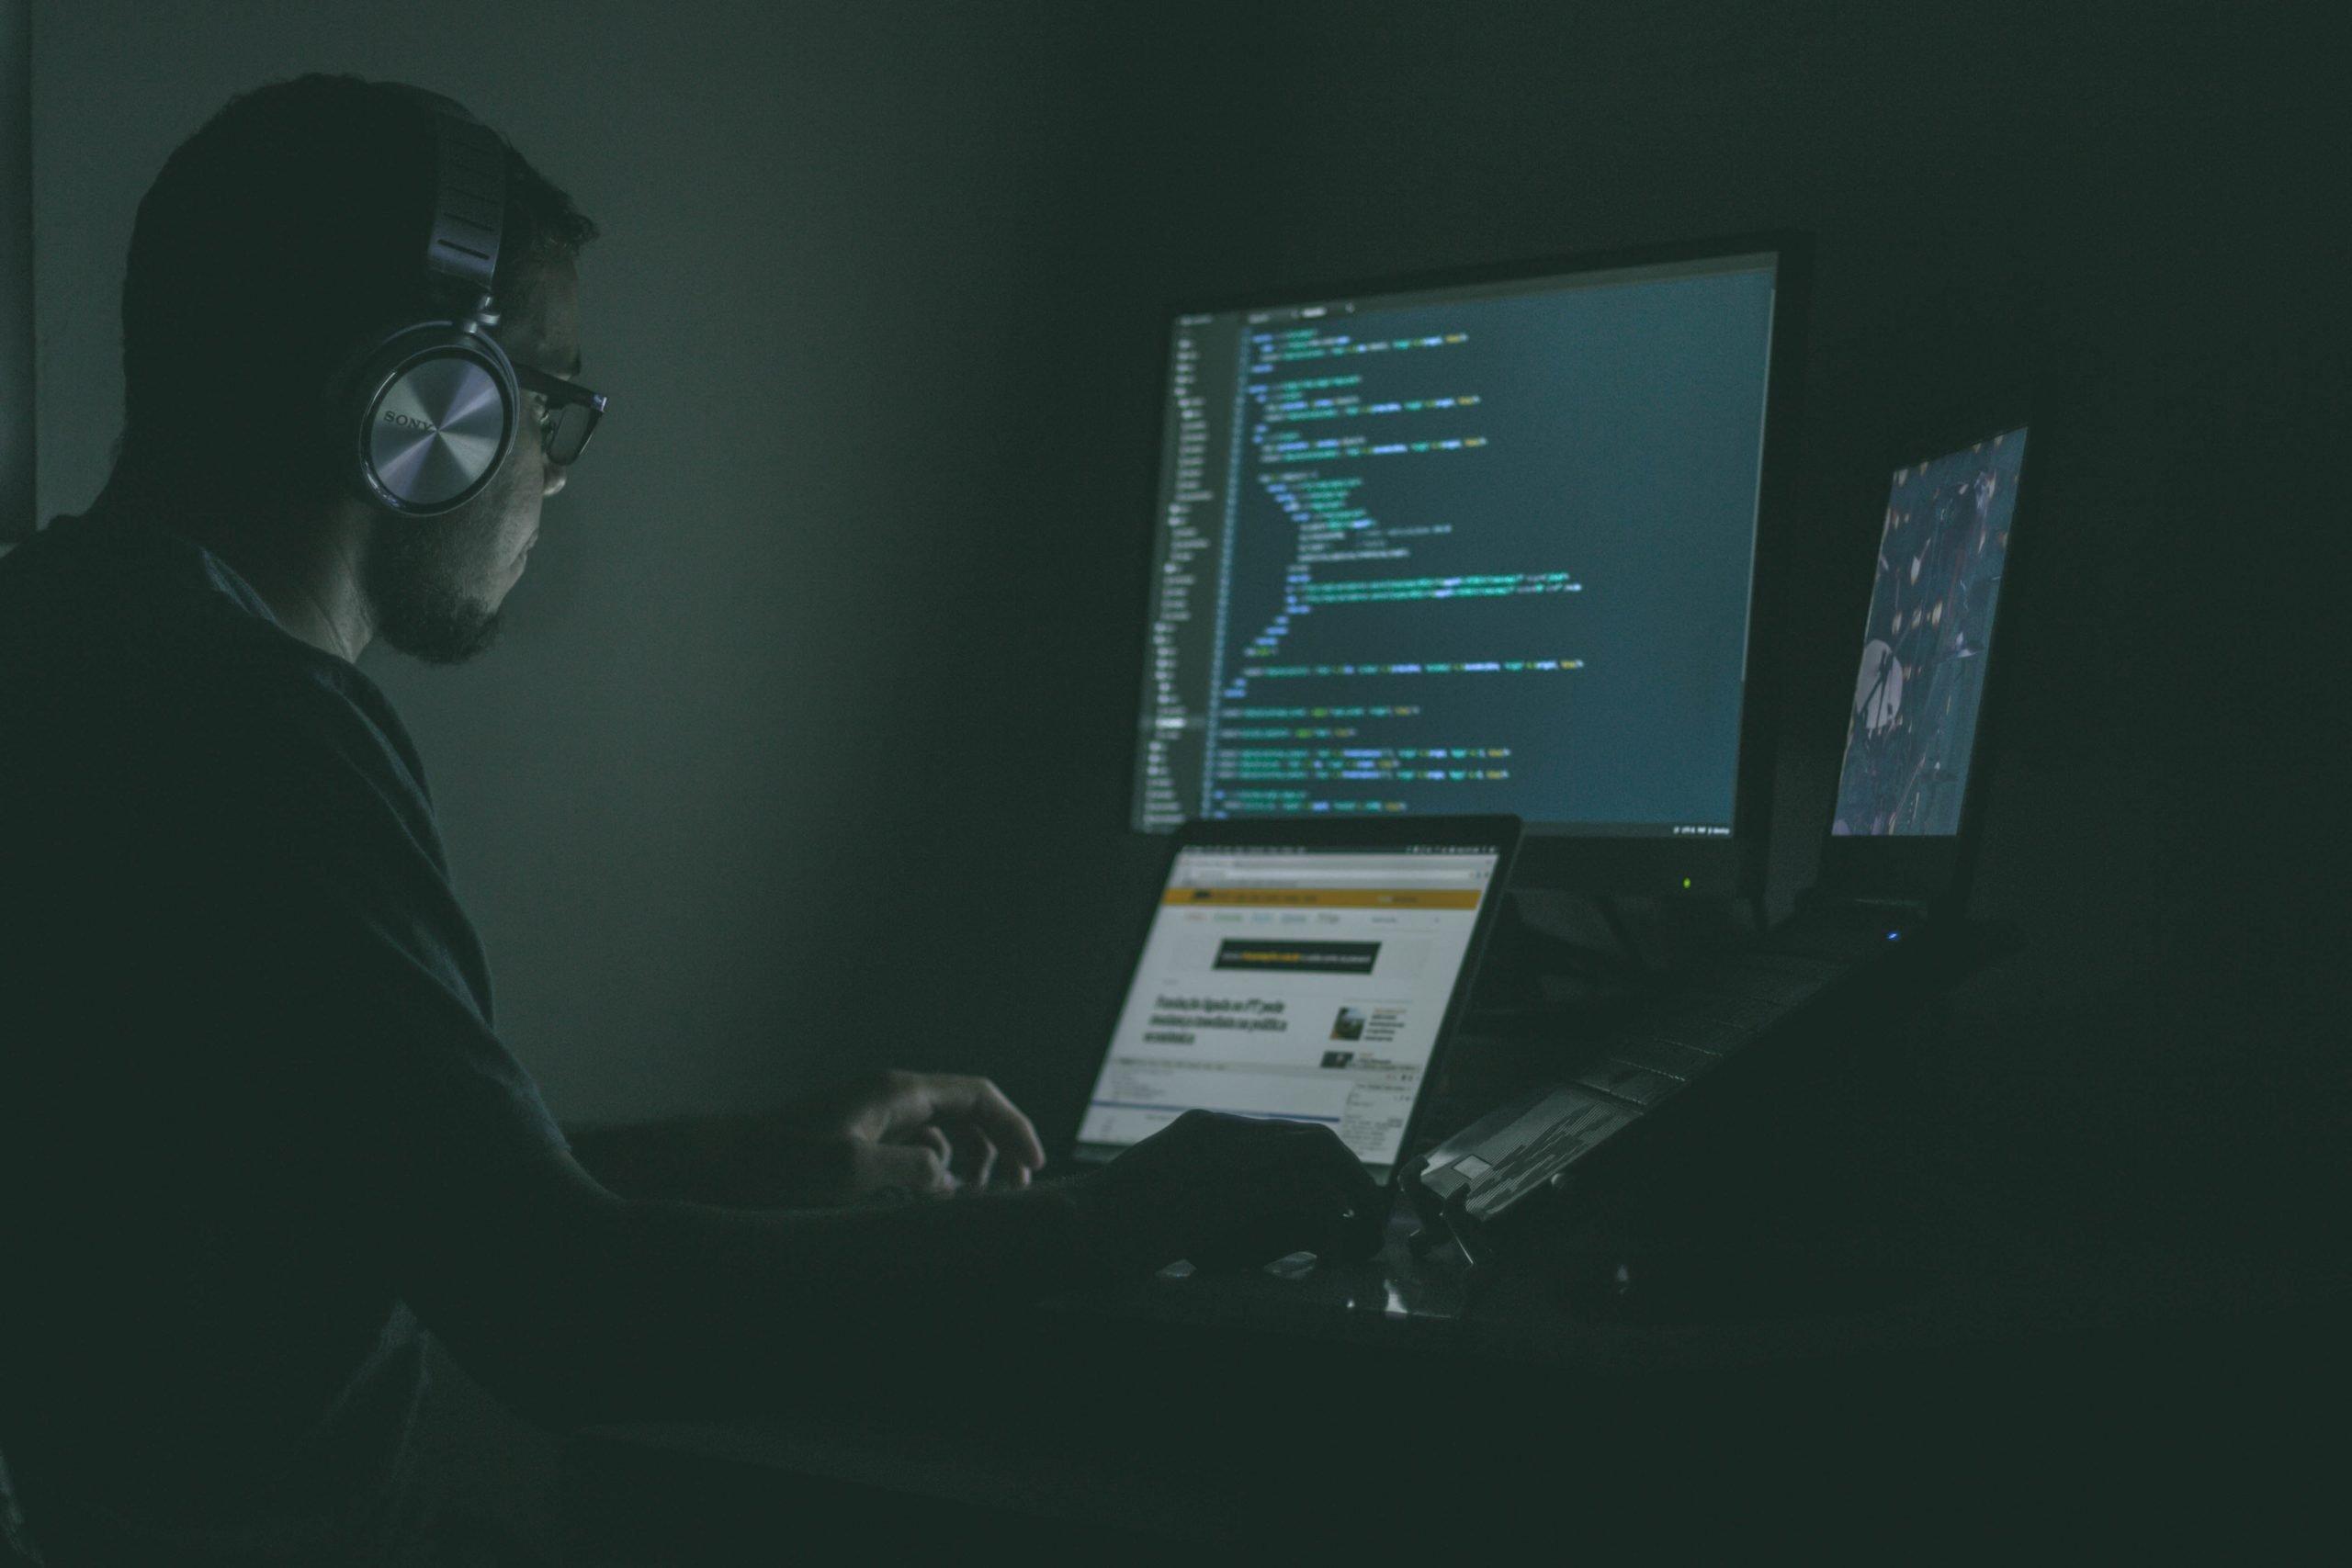 Ciberseguridad, principal amenaza para IoT